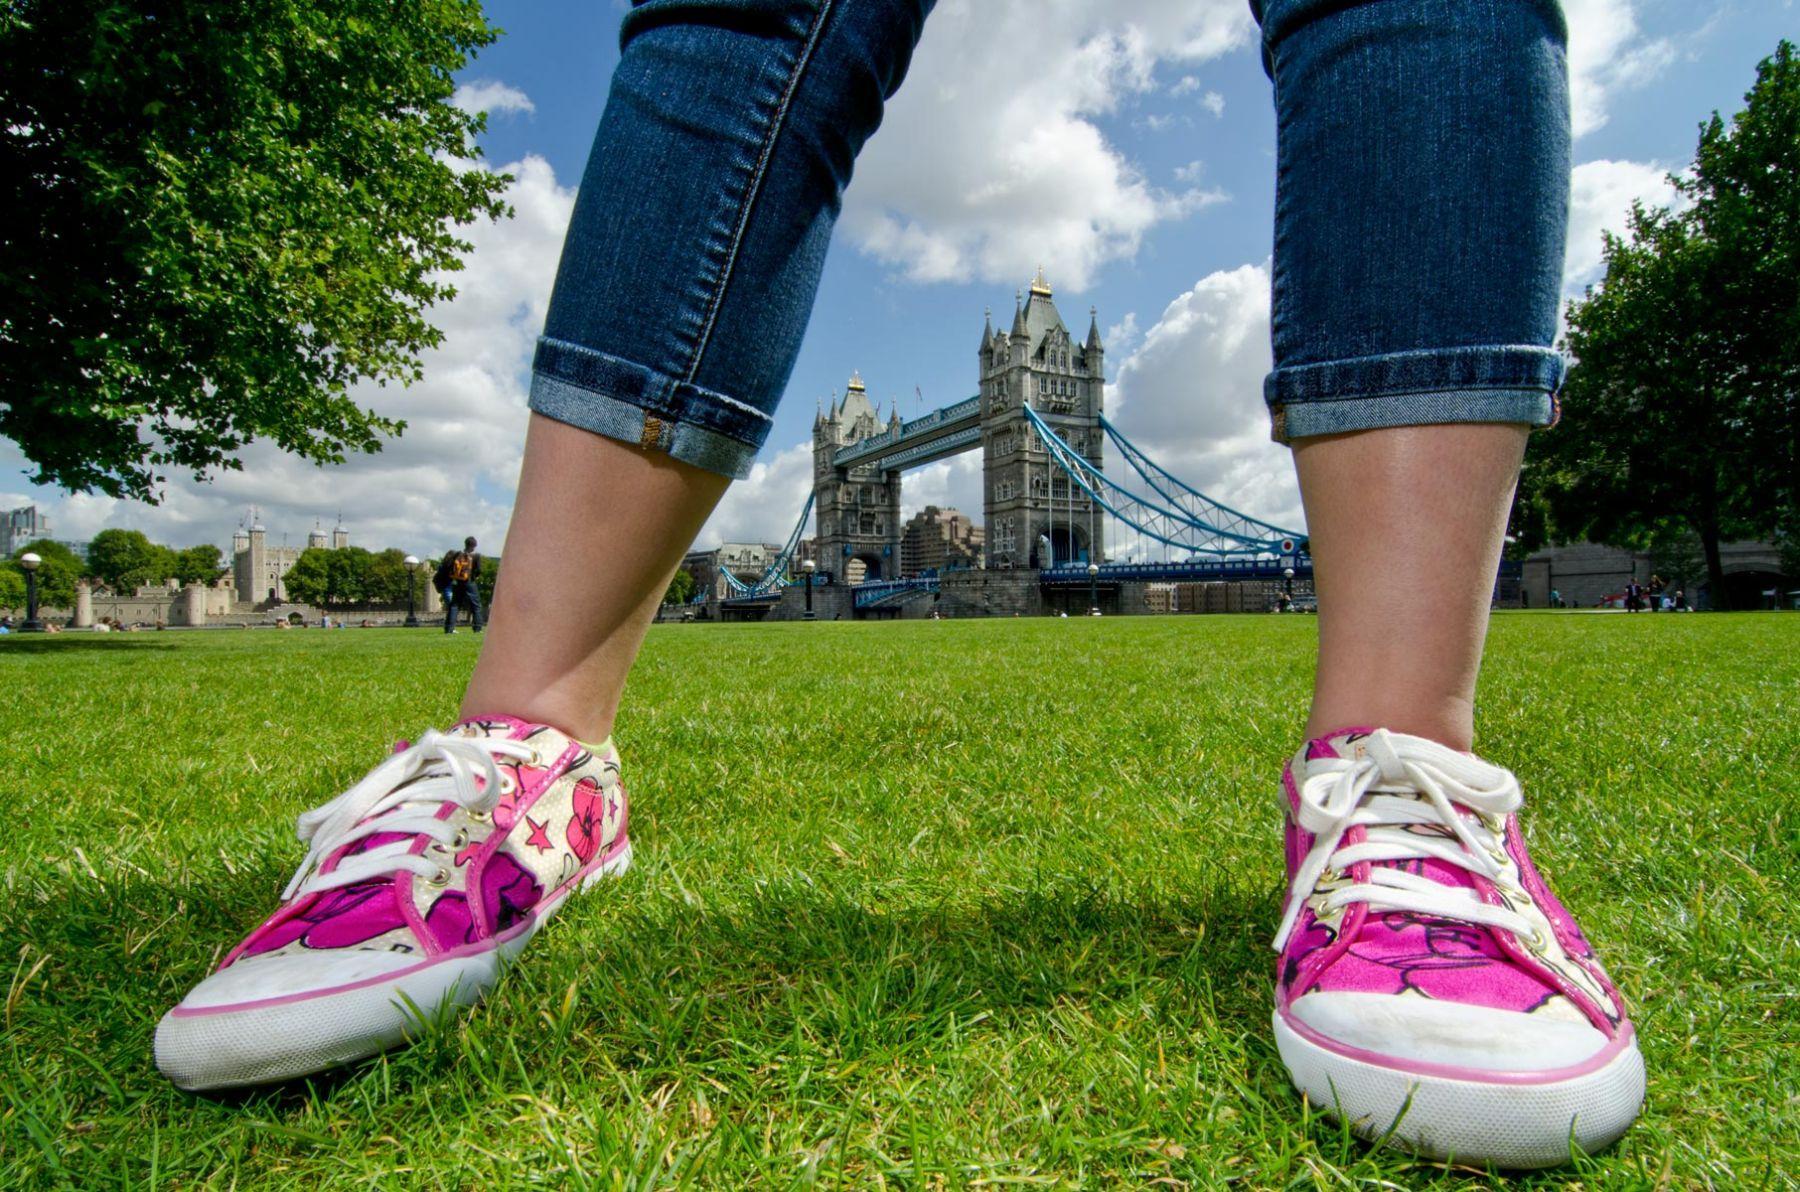 Tower Bridge through girl's legs